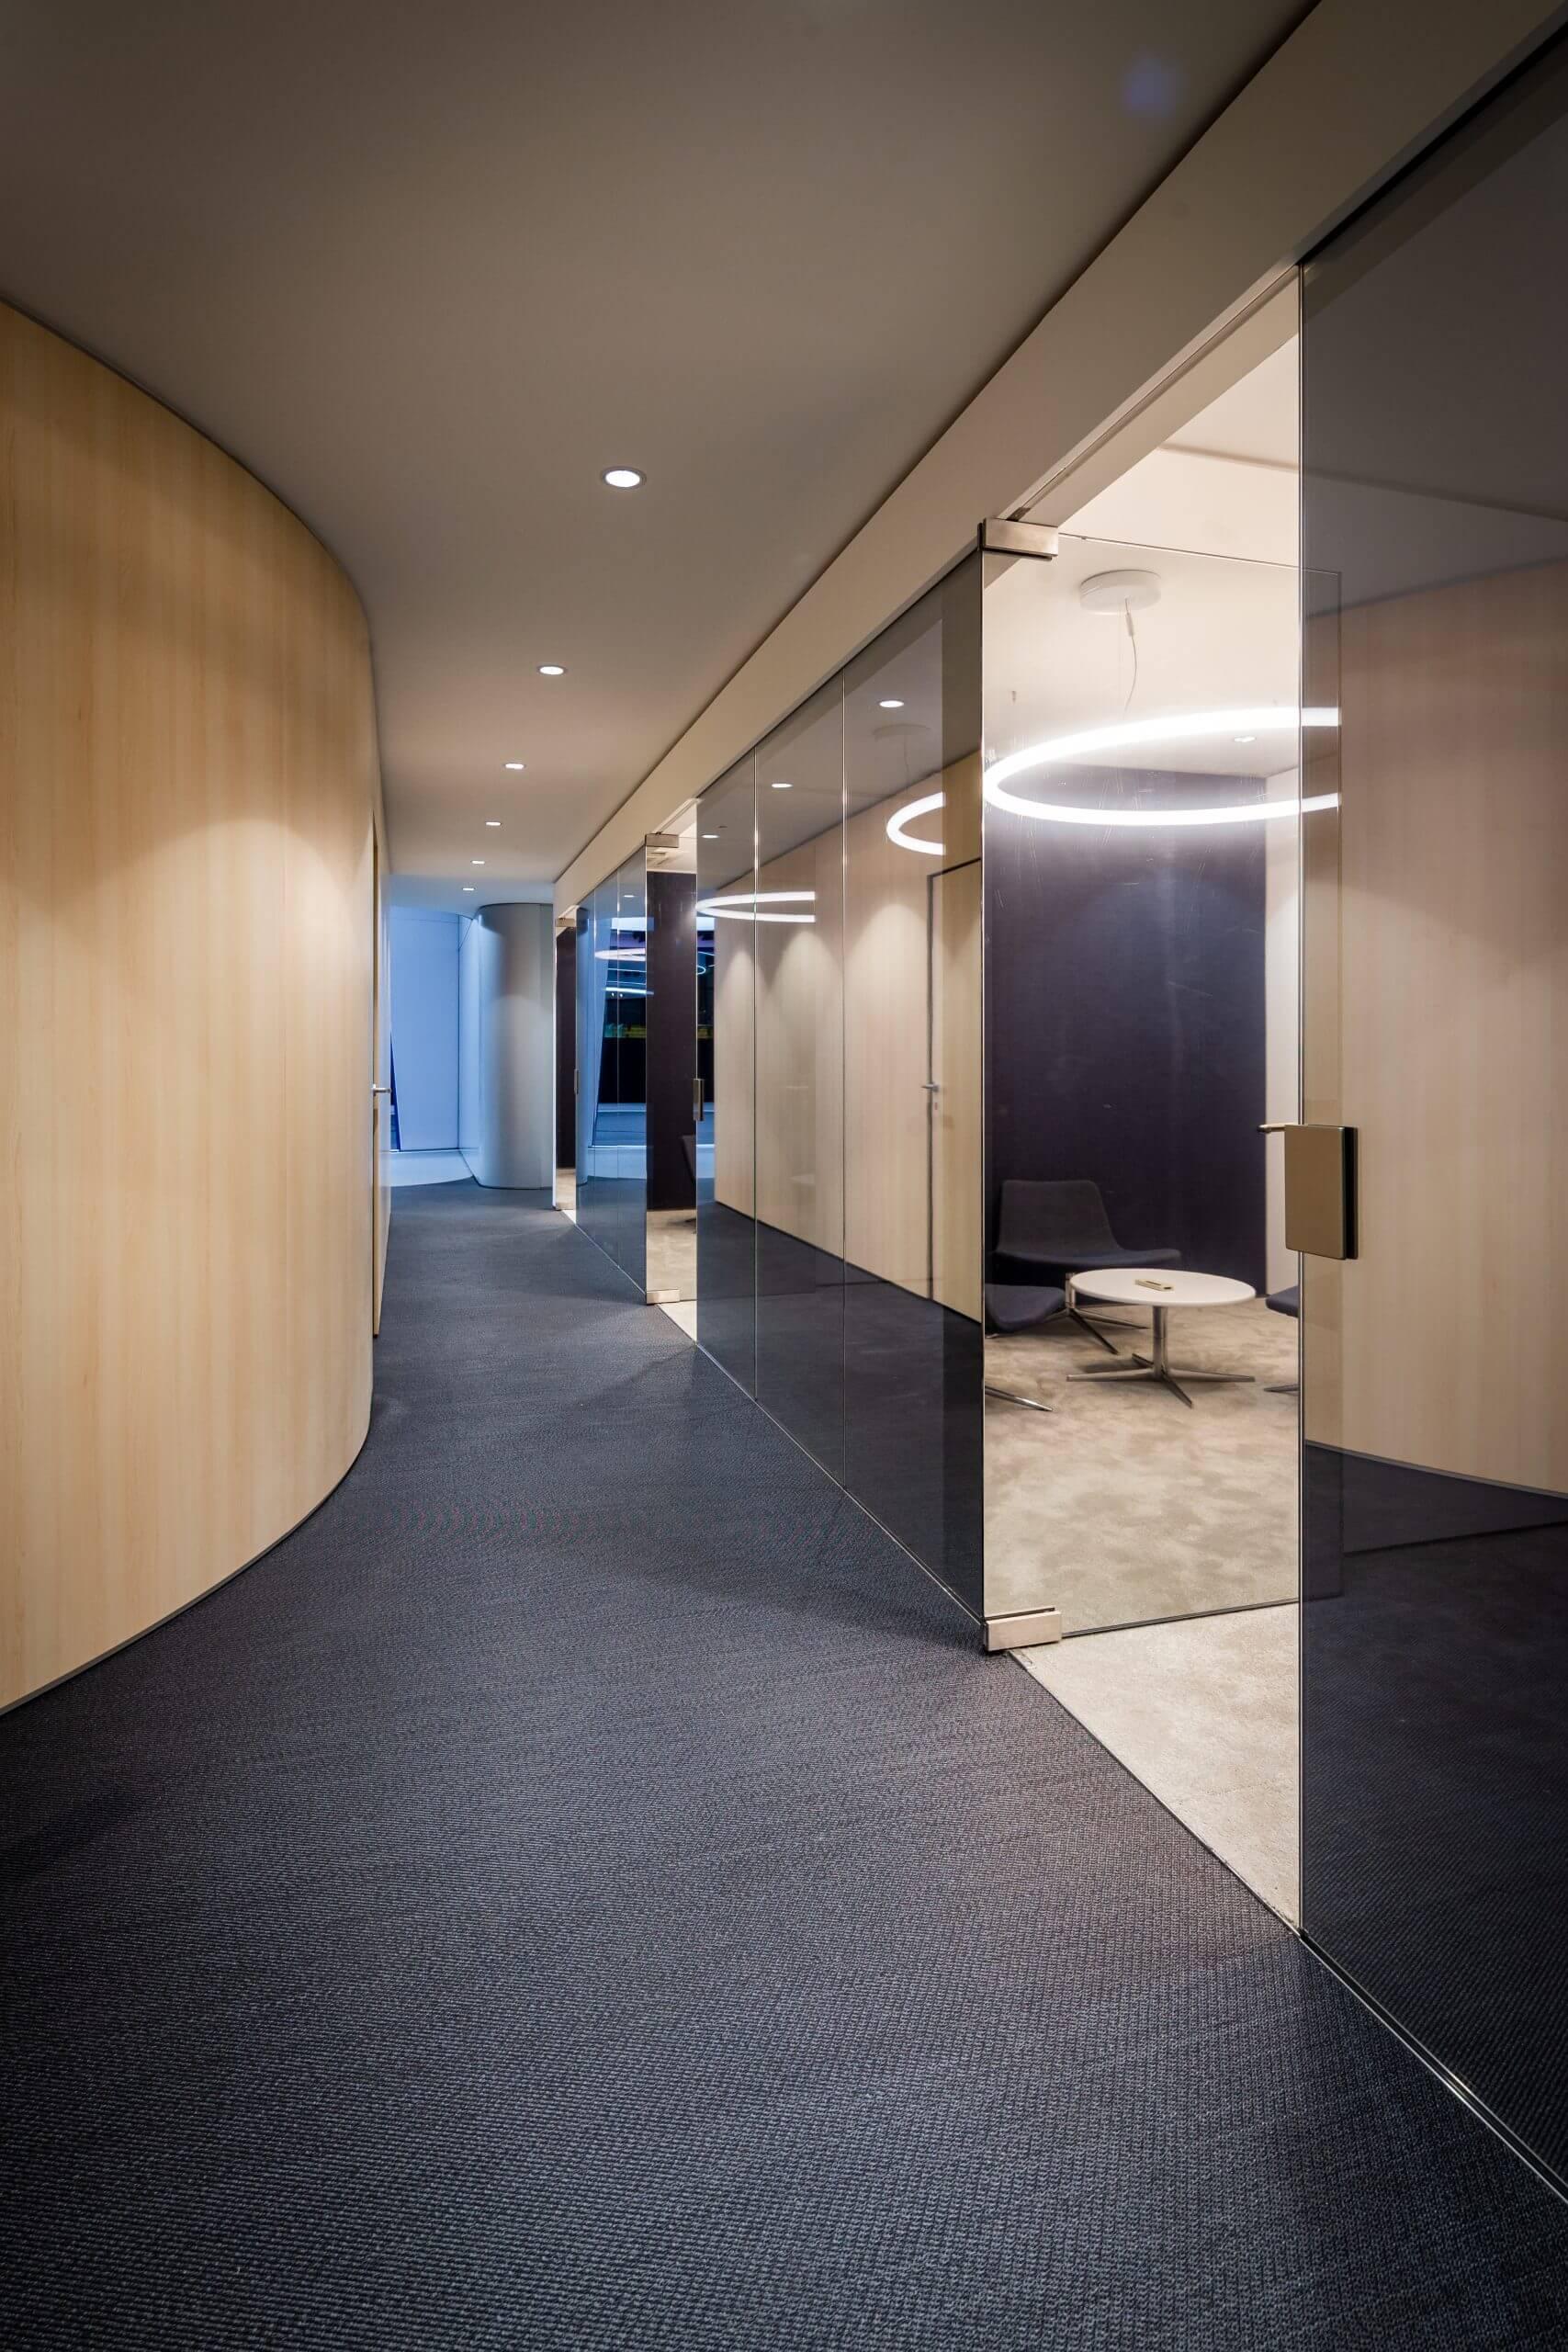 05_HYUNDAI_Photo-Meeting-Area-©Hyundai-Motor-Company